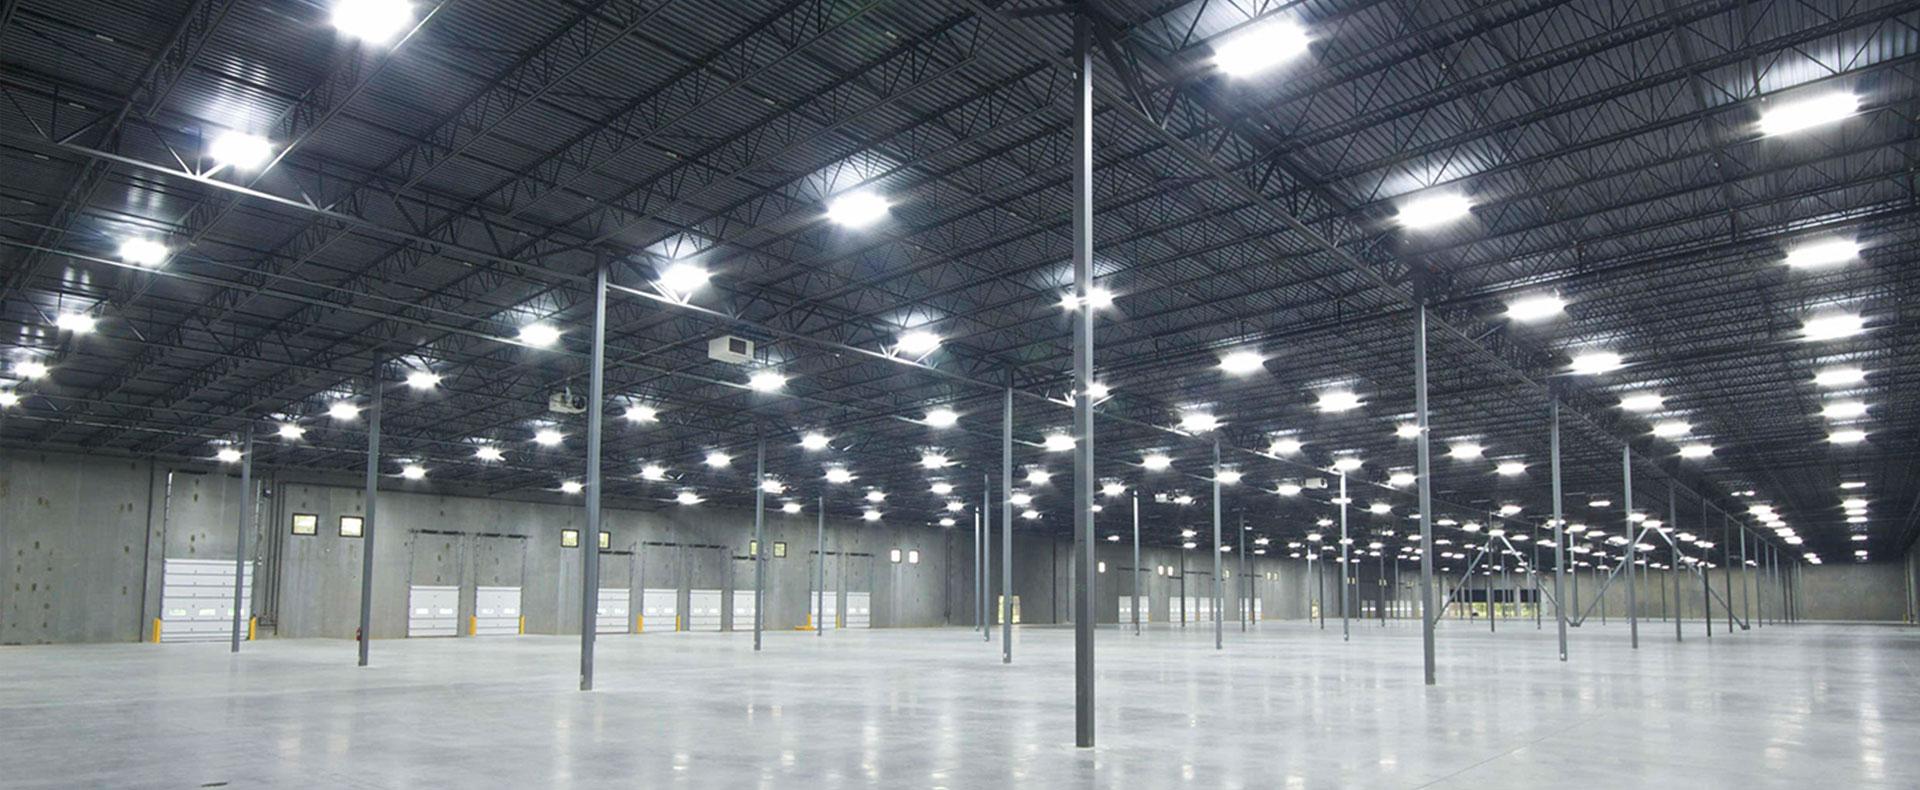 Spacious Interior steel warehouse with key light tracks.